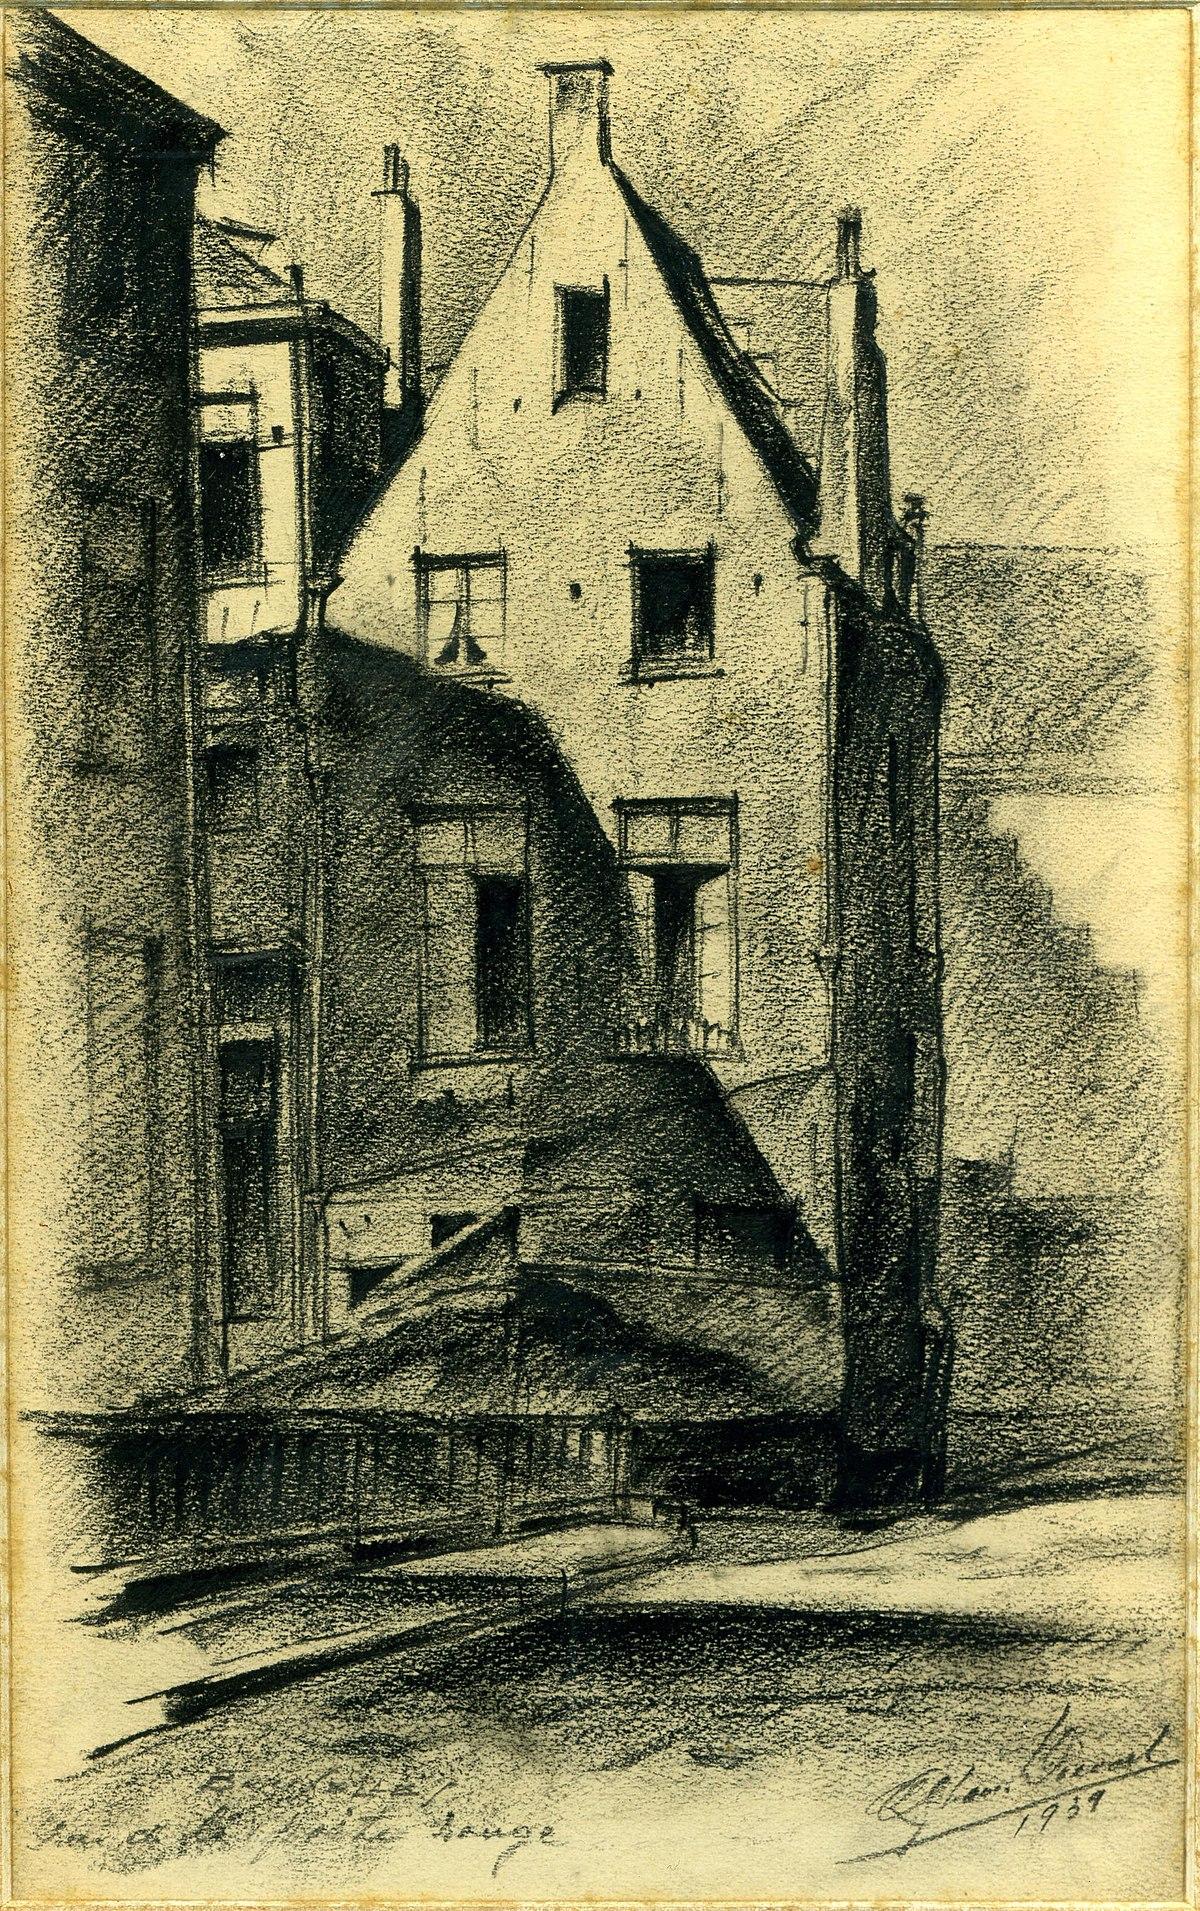 Dessin Porte Maison : Rue haute — wikipédia